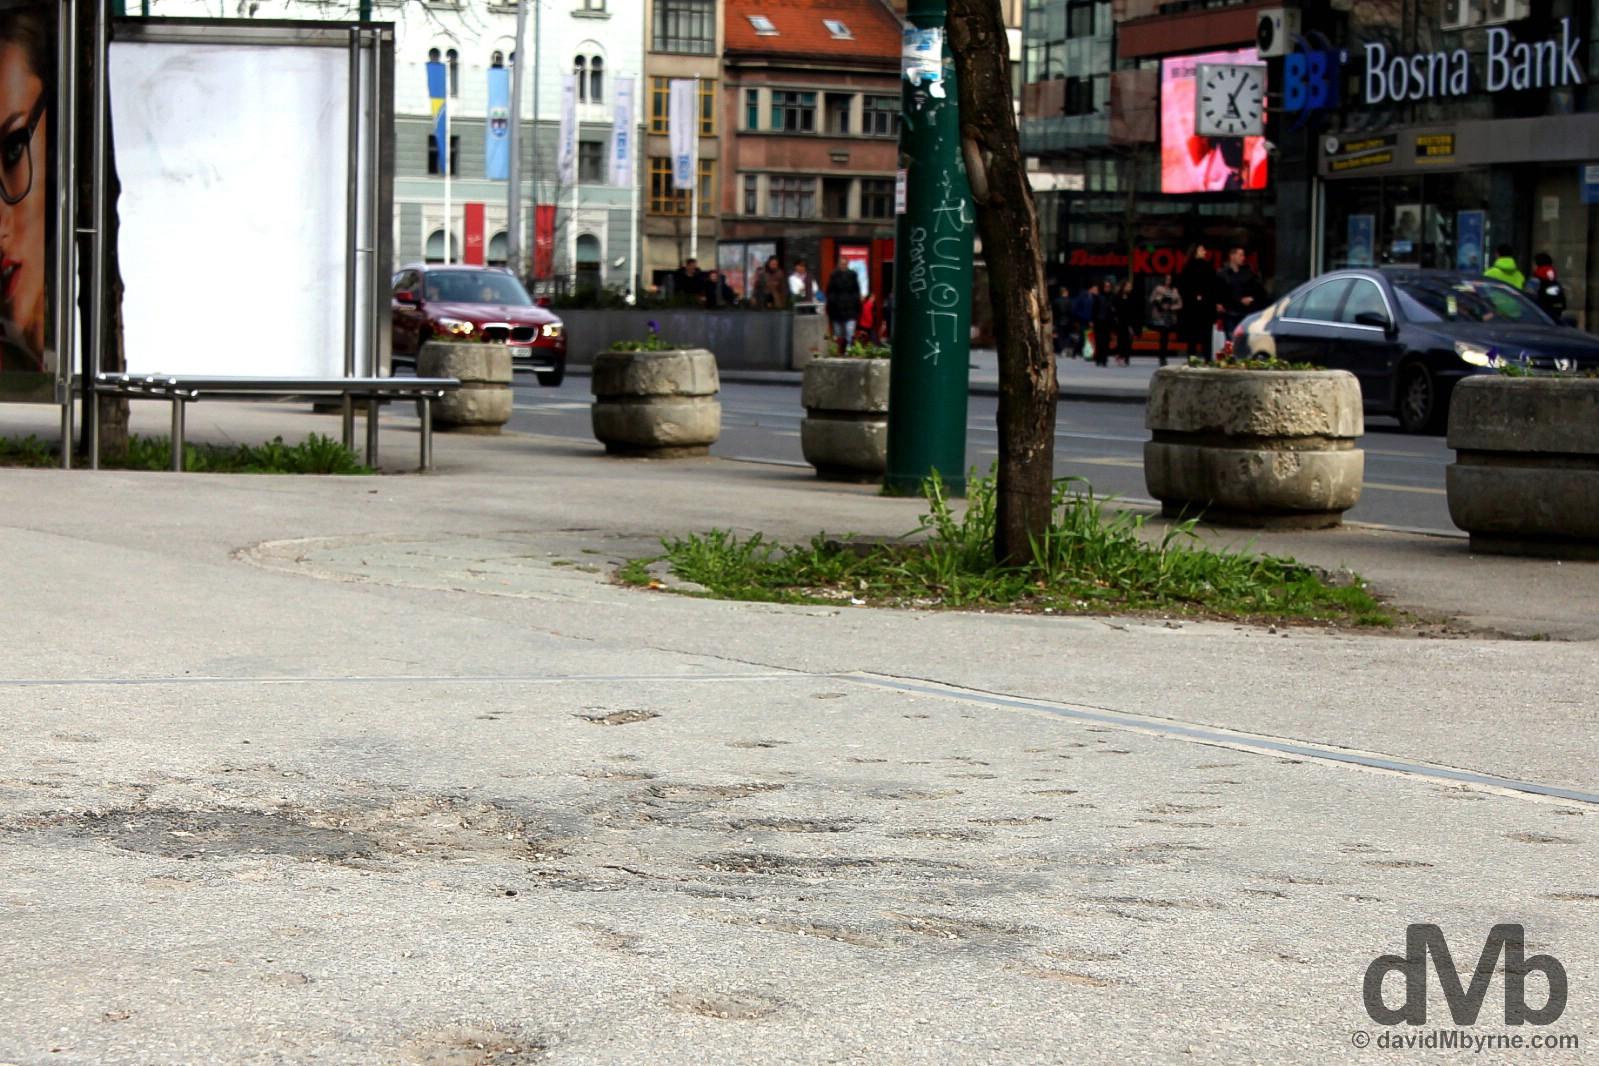 Bosnian War scars on the streets of Sarajevo, Bosnia and Herzegovina. April 4, 2015.